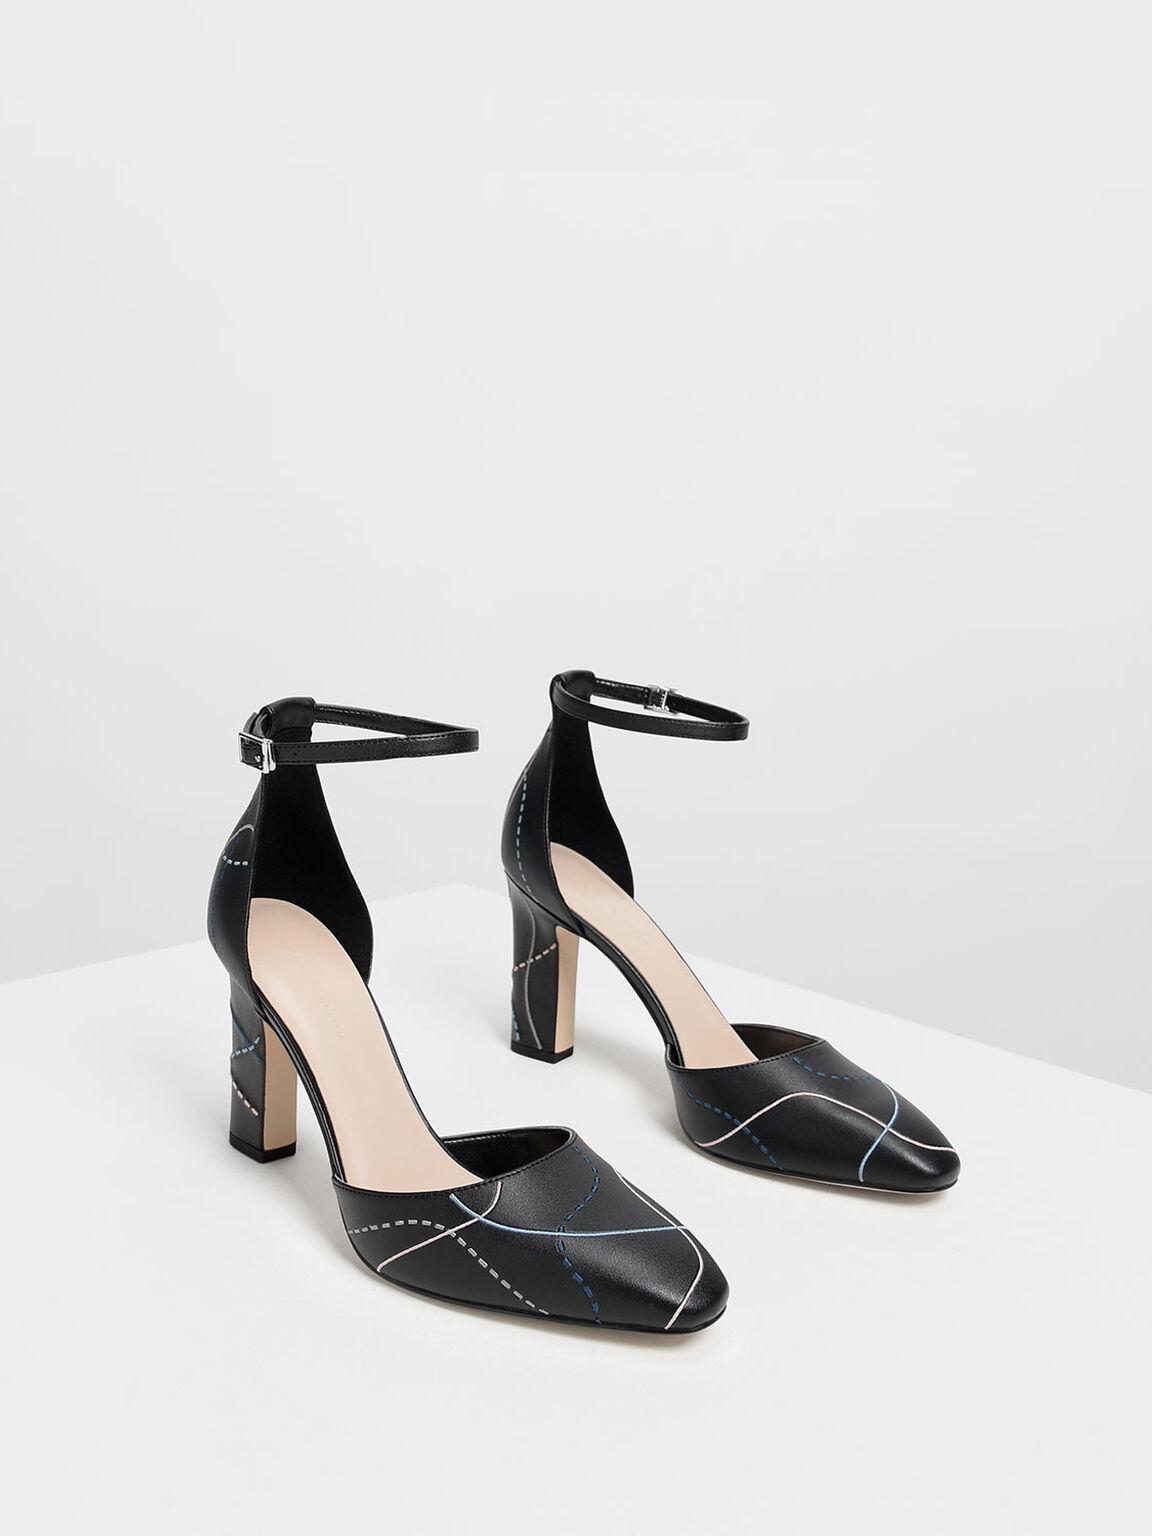 Almond Toe Ankle Strap Heels, Black, hi-res